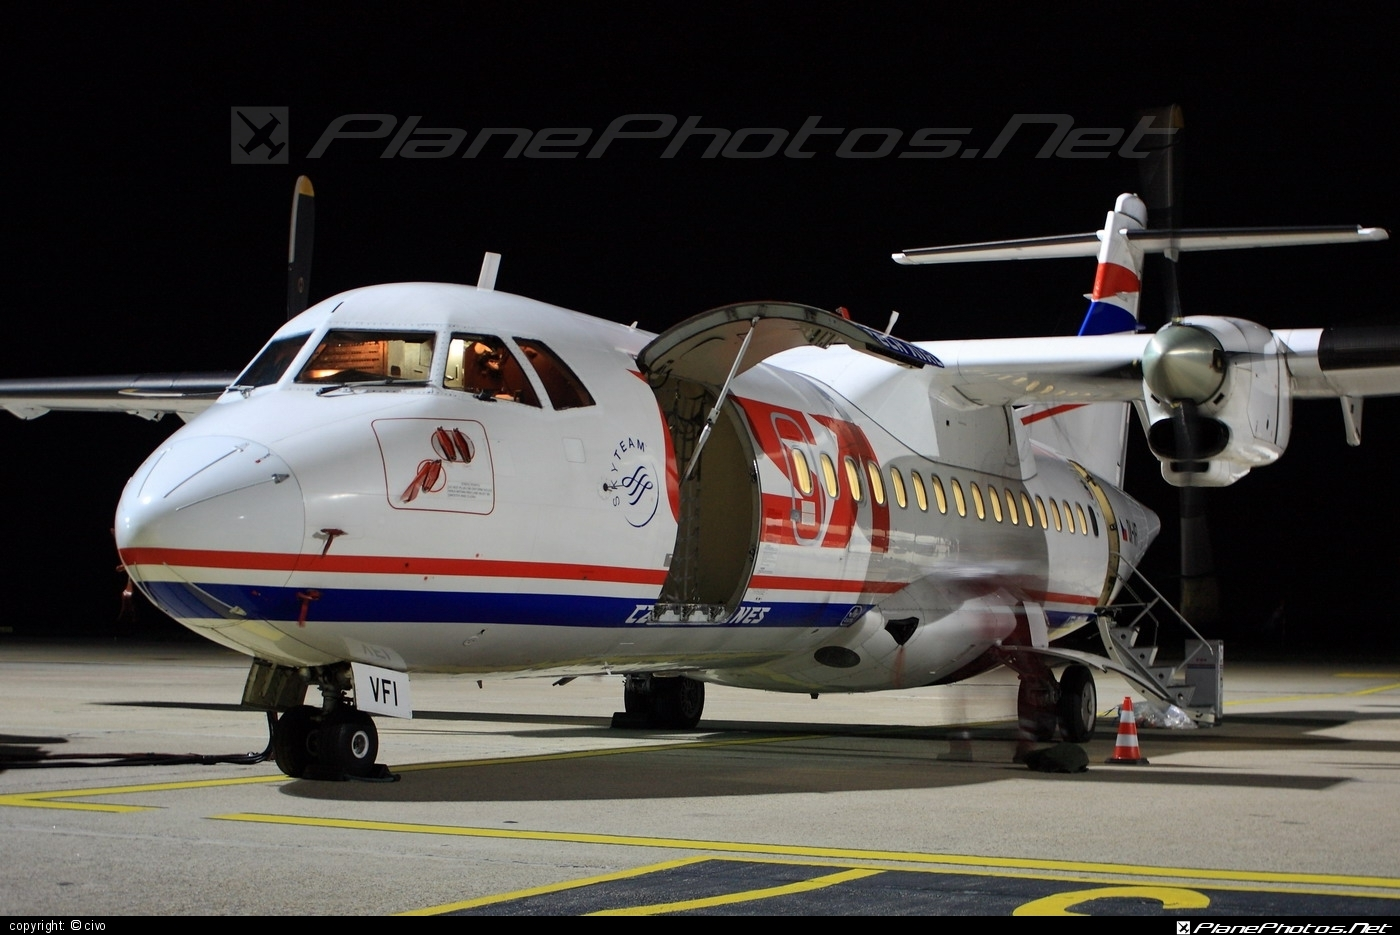 ATR 42-300 - OK-VFI operated by CSA Czech Airlines #atr #atr42 #atr42300 #csa #czechairlines